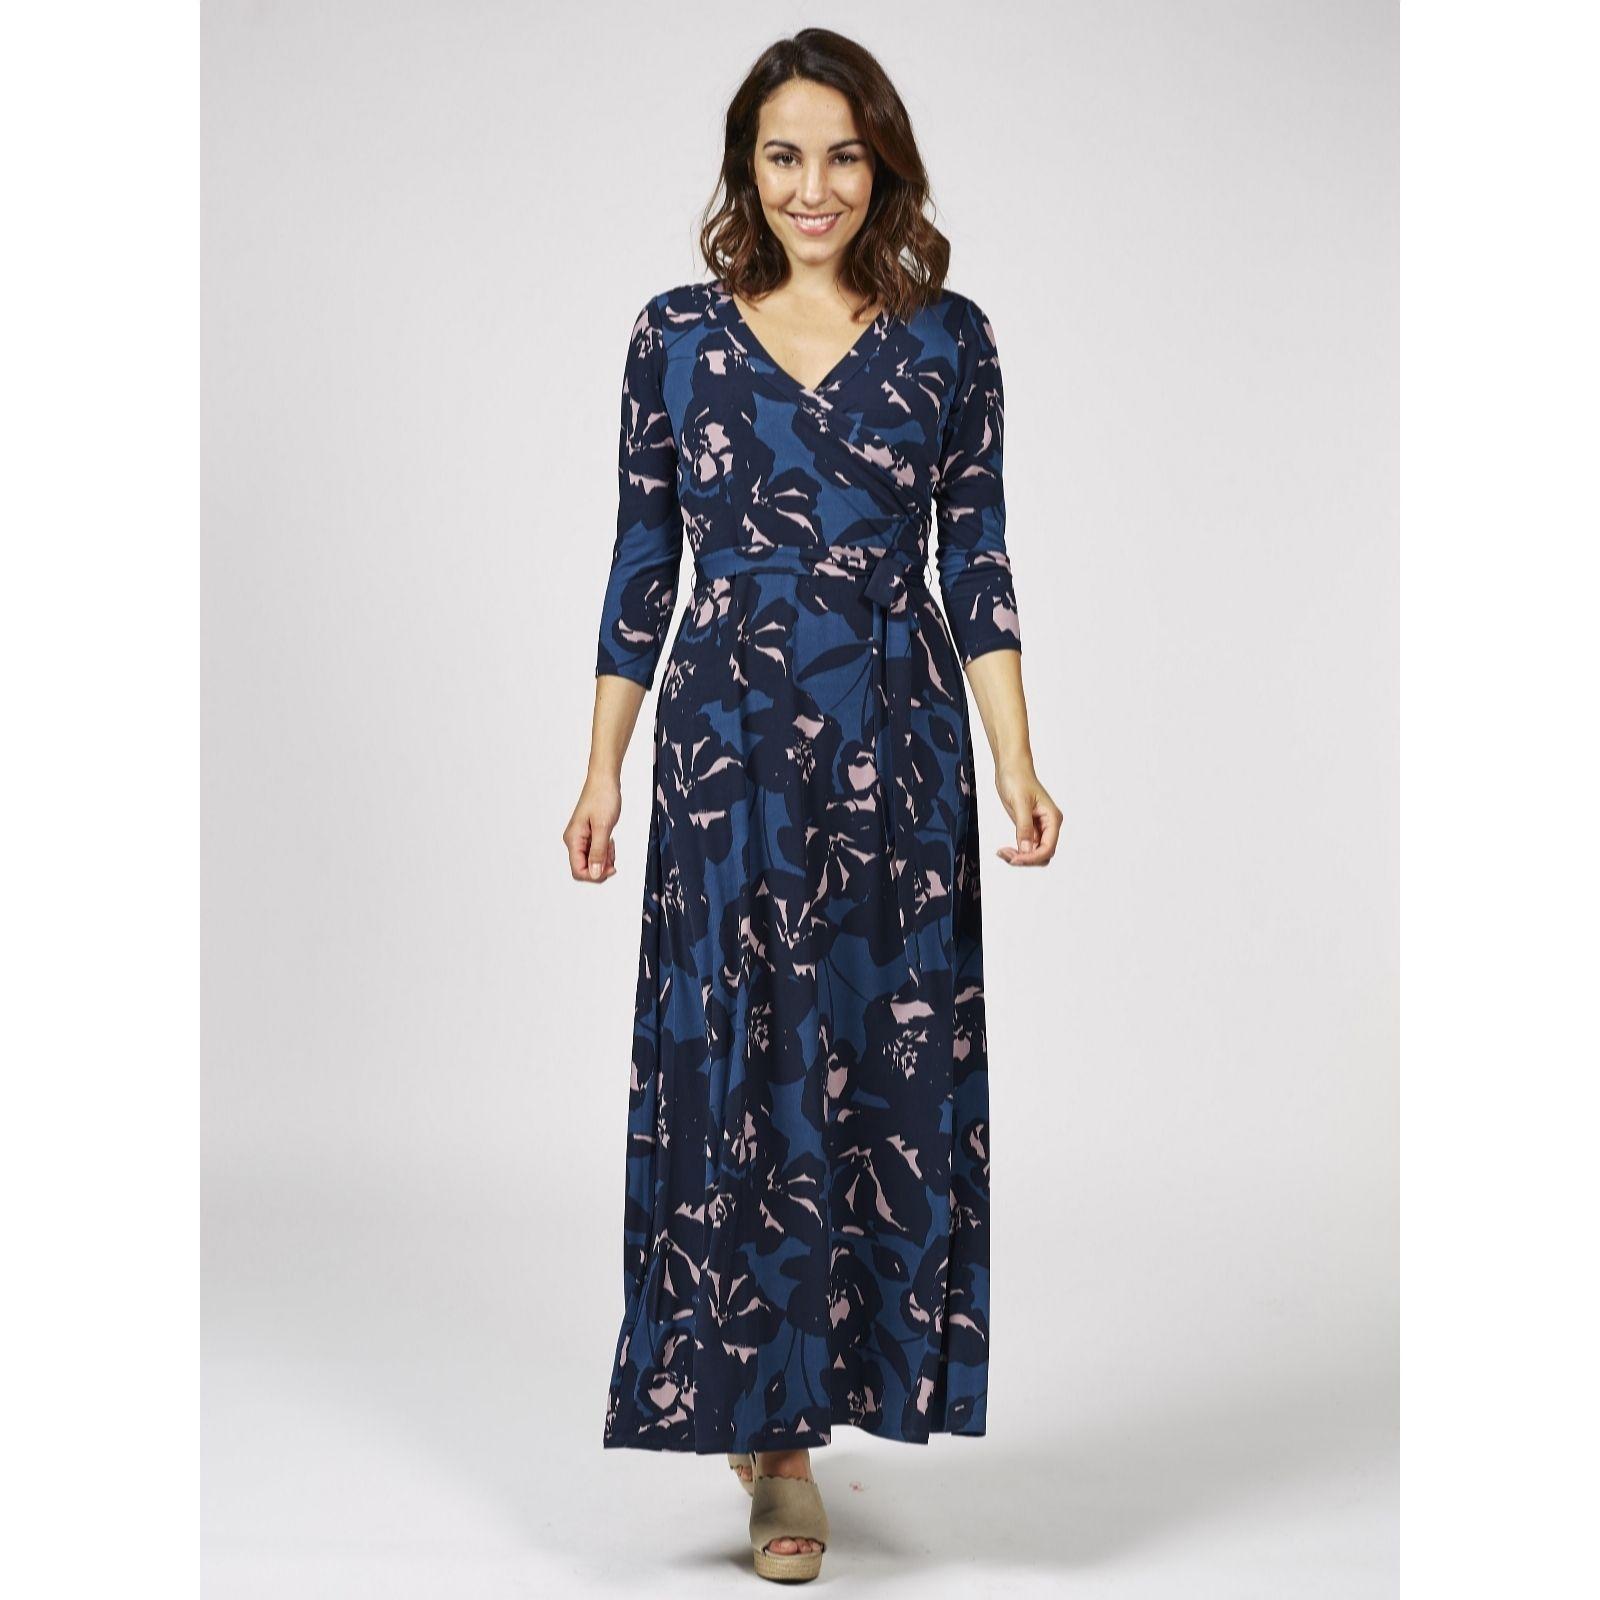 3ed2755f87ded Du Jour Printed Wrap Knit Maxi Dress Regular - QVC UK